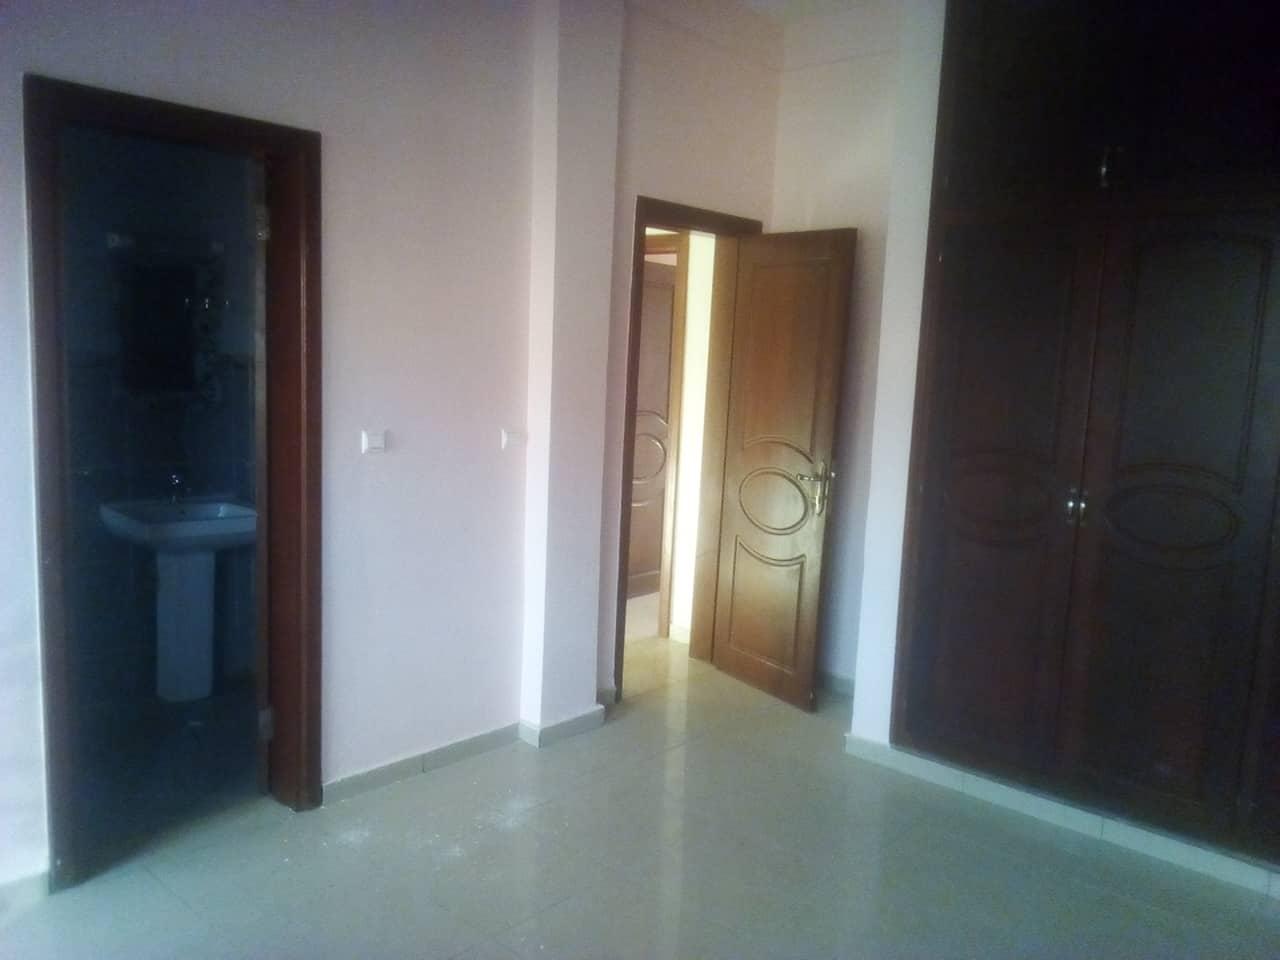 Apartment to rent - Yaoundé, Ngousso, fabrique - 1 living room(s), 3 bedroom(s), 3 bathroom(s) - 300 000 FCFA / month